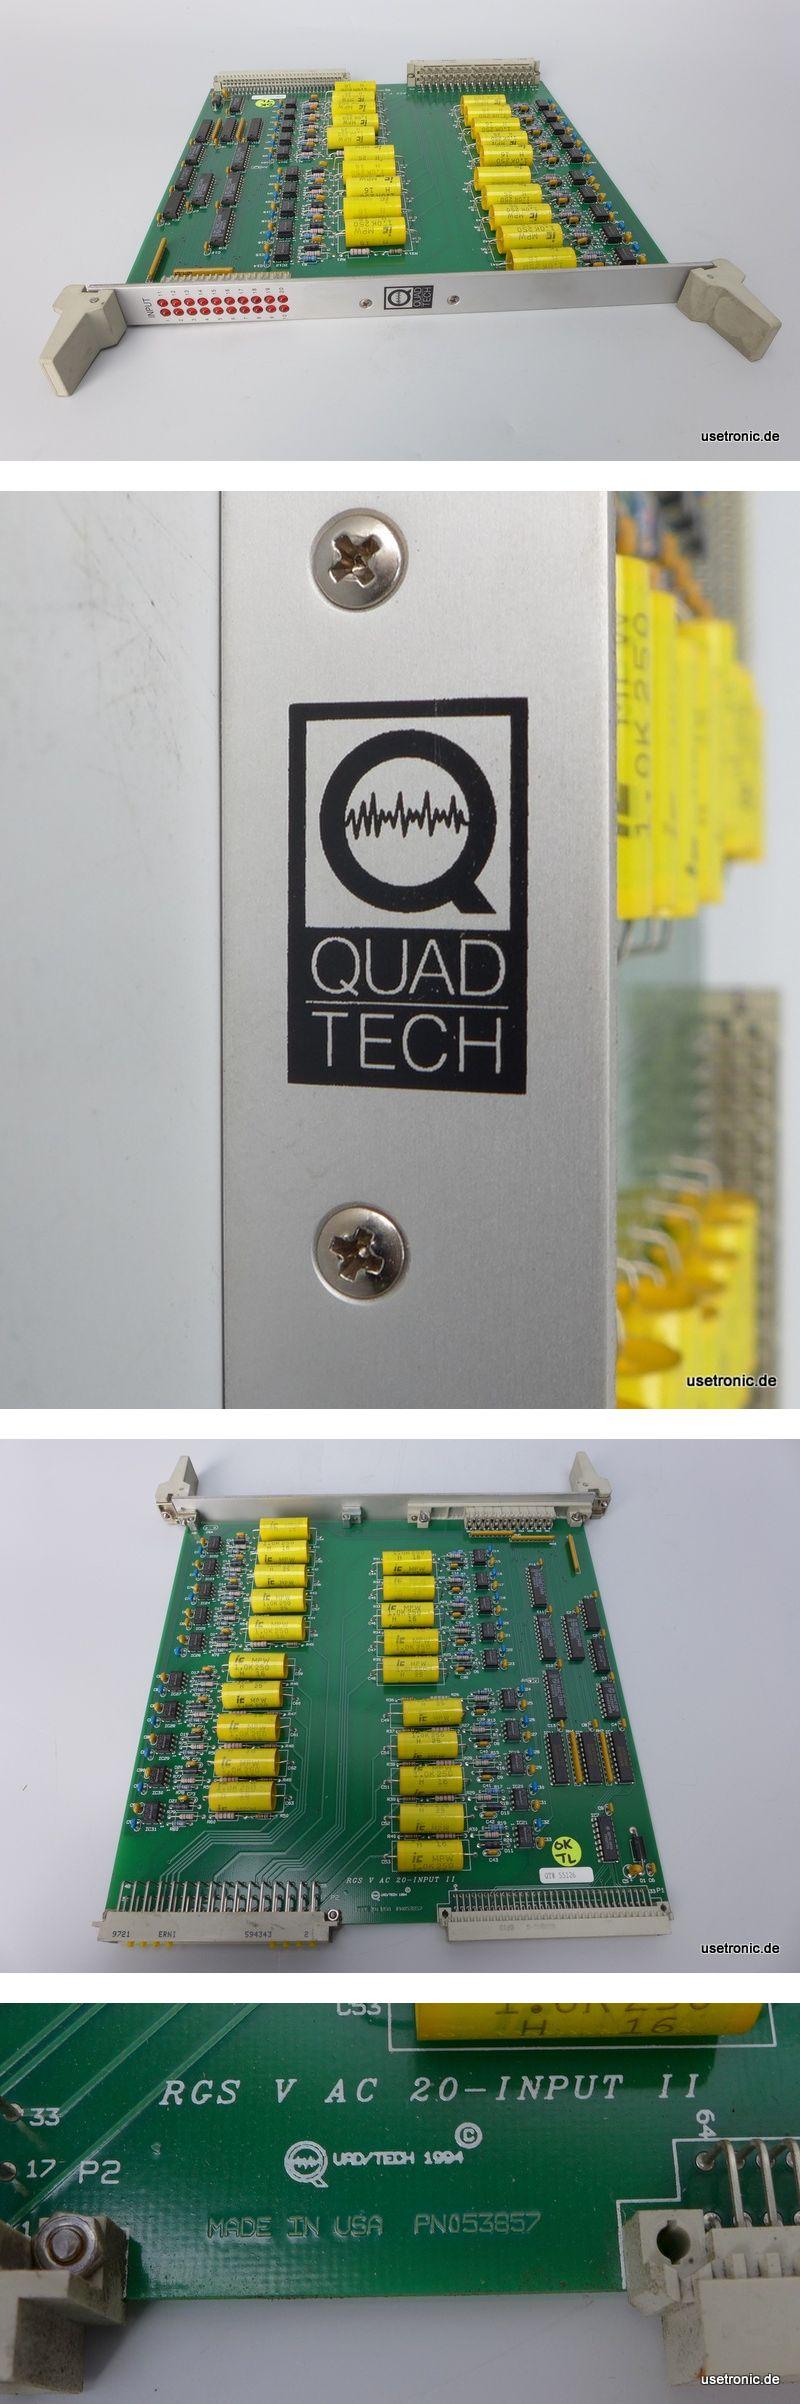 Quadtech RGS V AC 20-input PN 053857